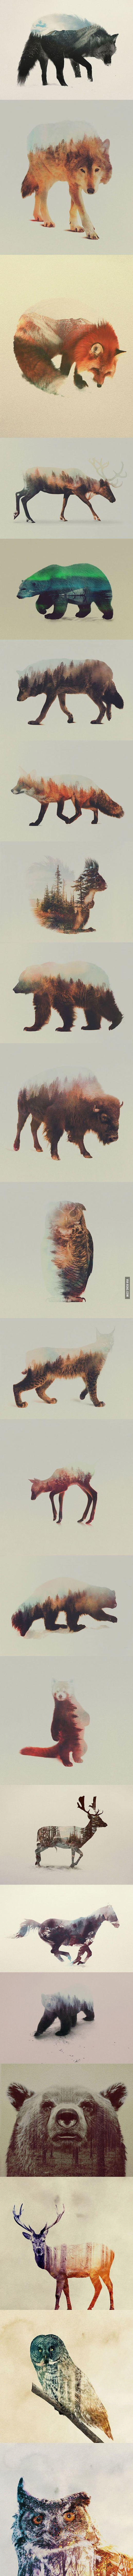 Andreas Lie, Art, Double Exposure Animals